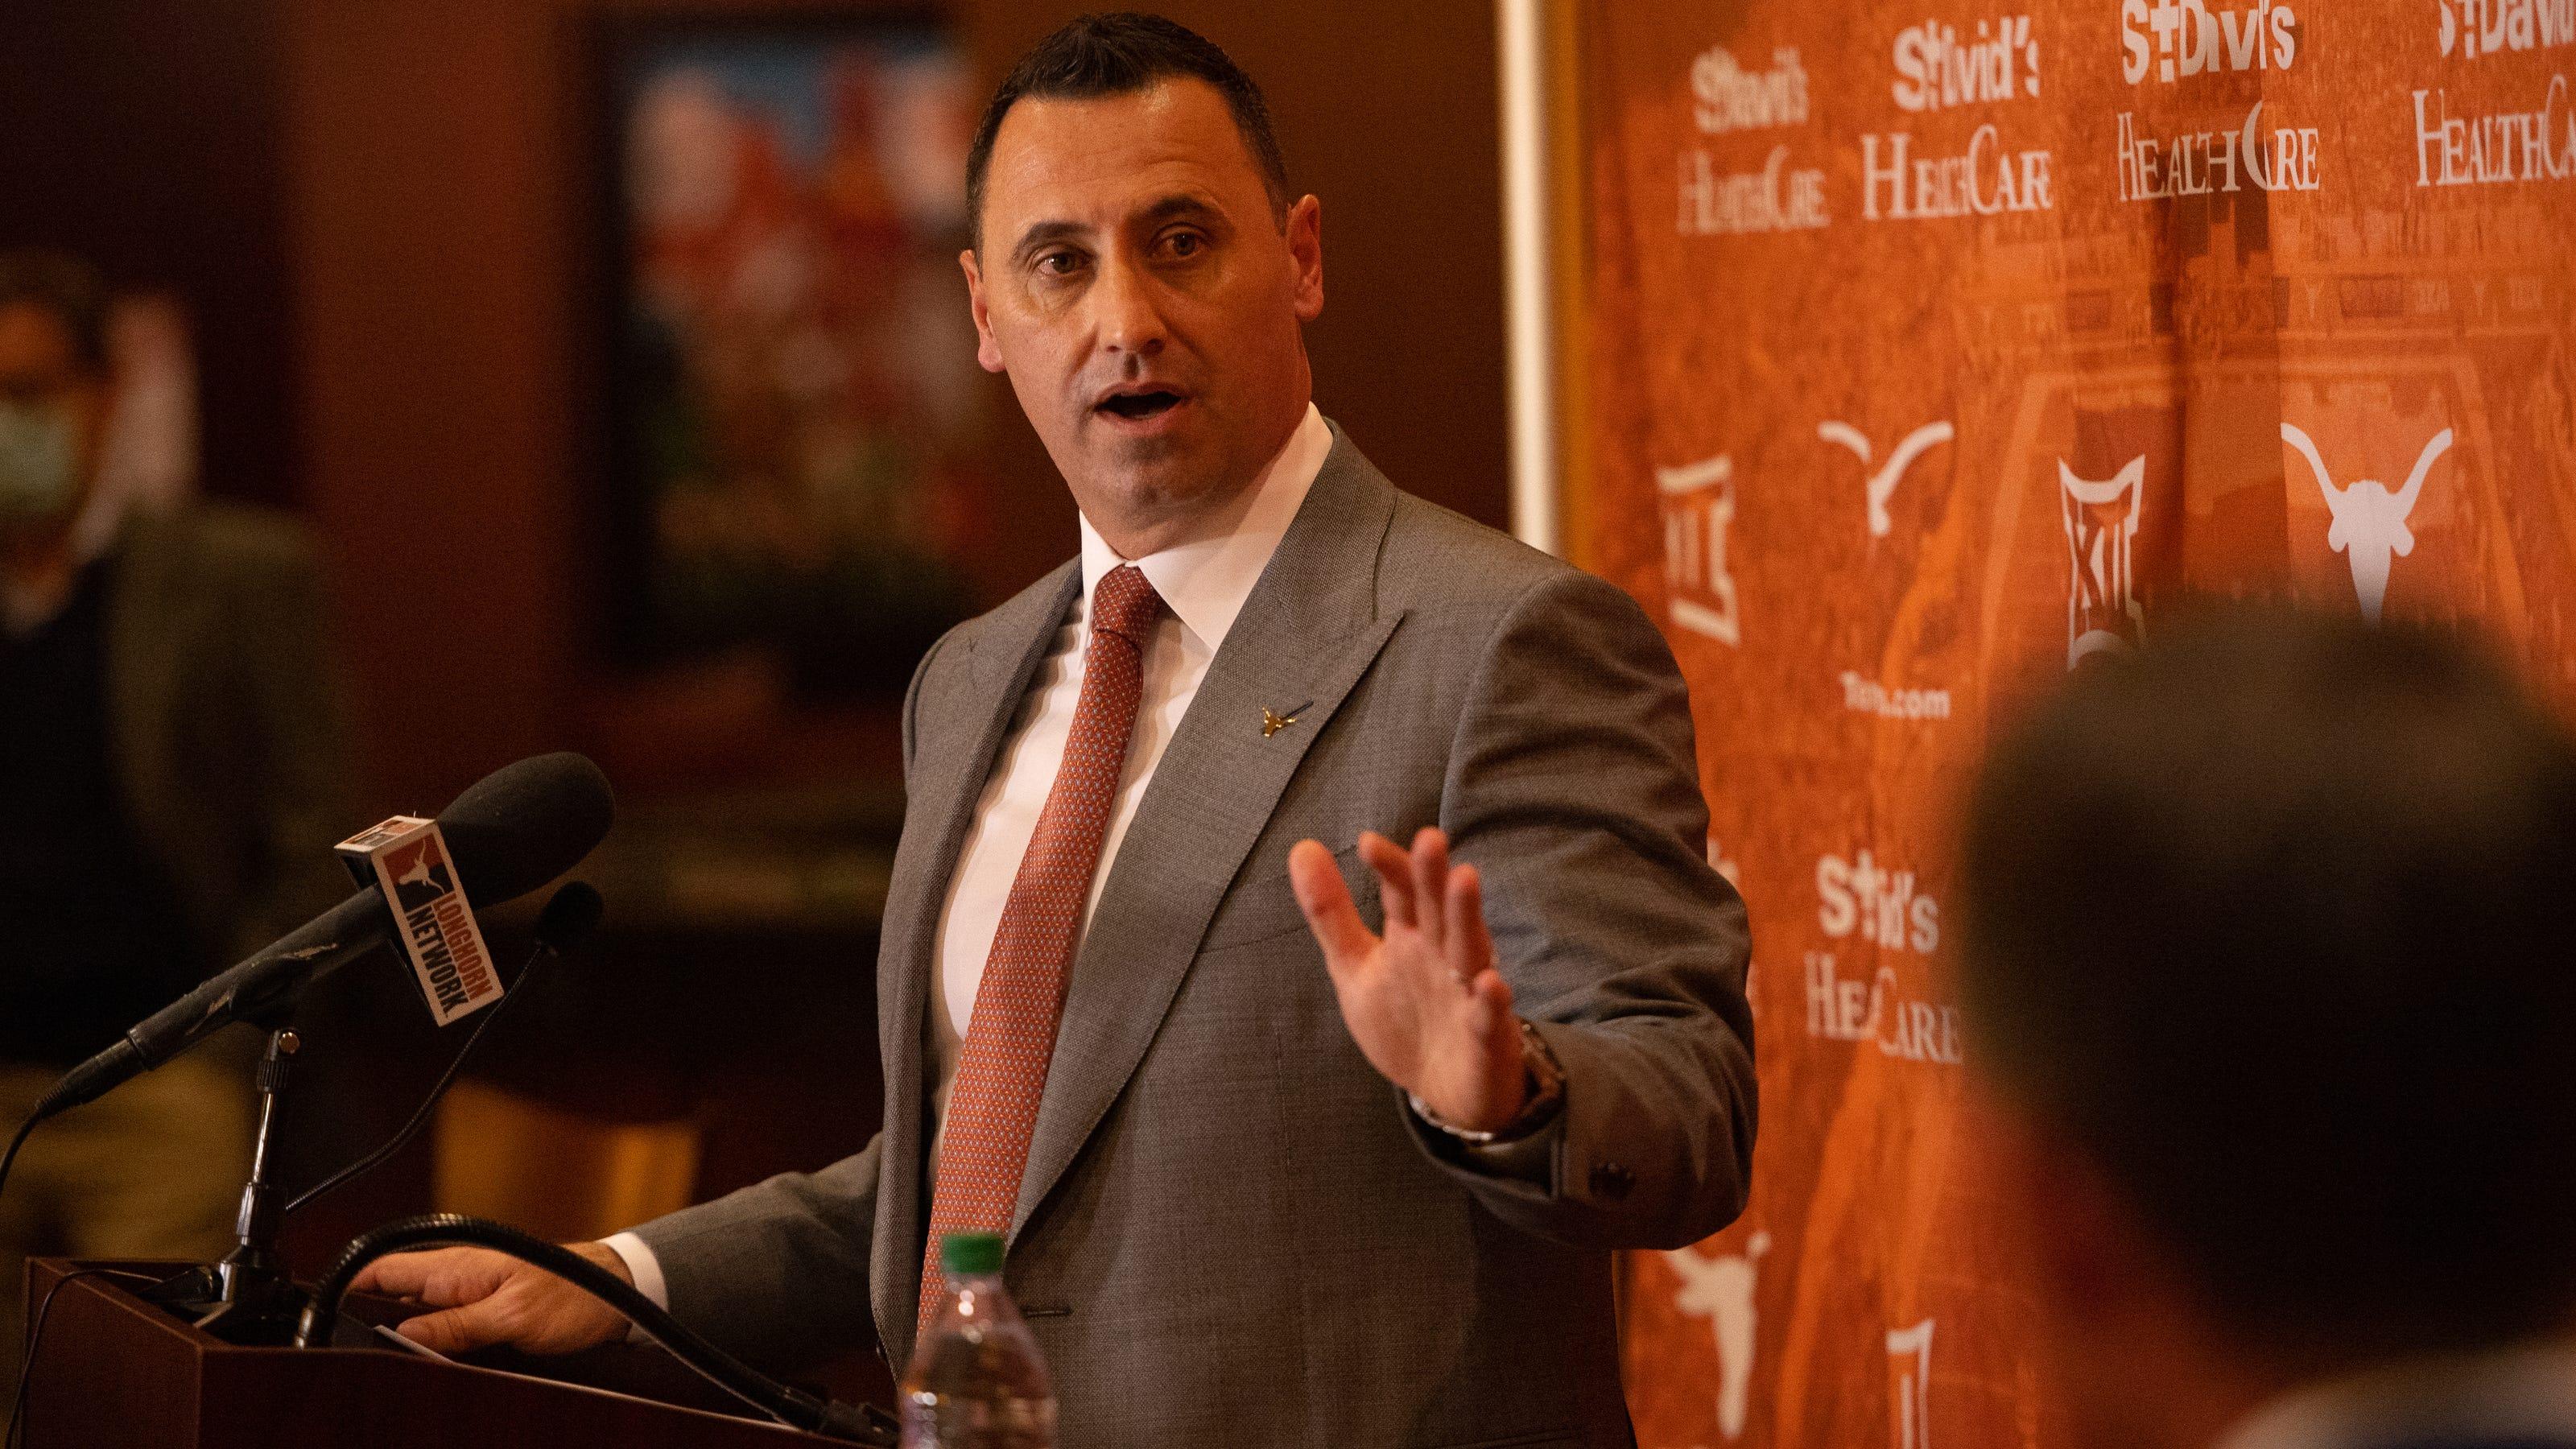 Texas coach Steve Sarkisian set to receive six-year deal worth $34.2 million